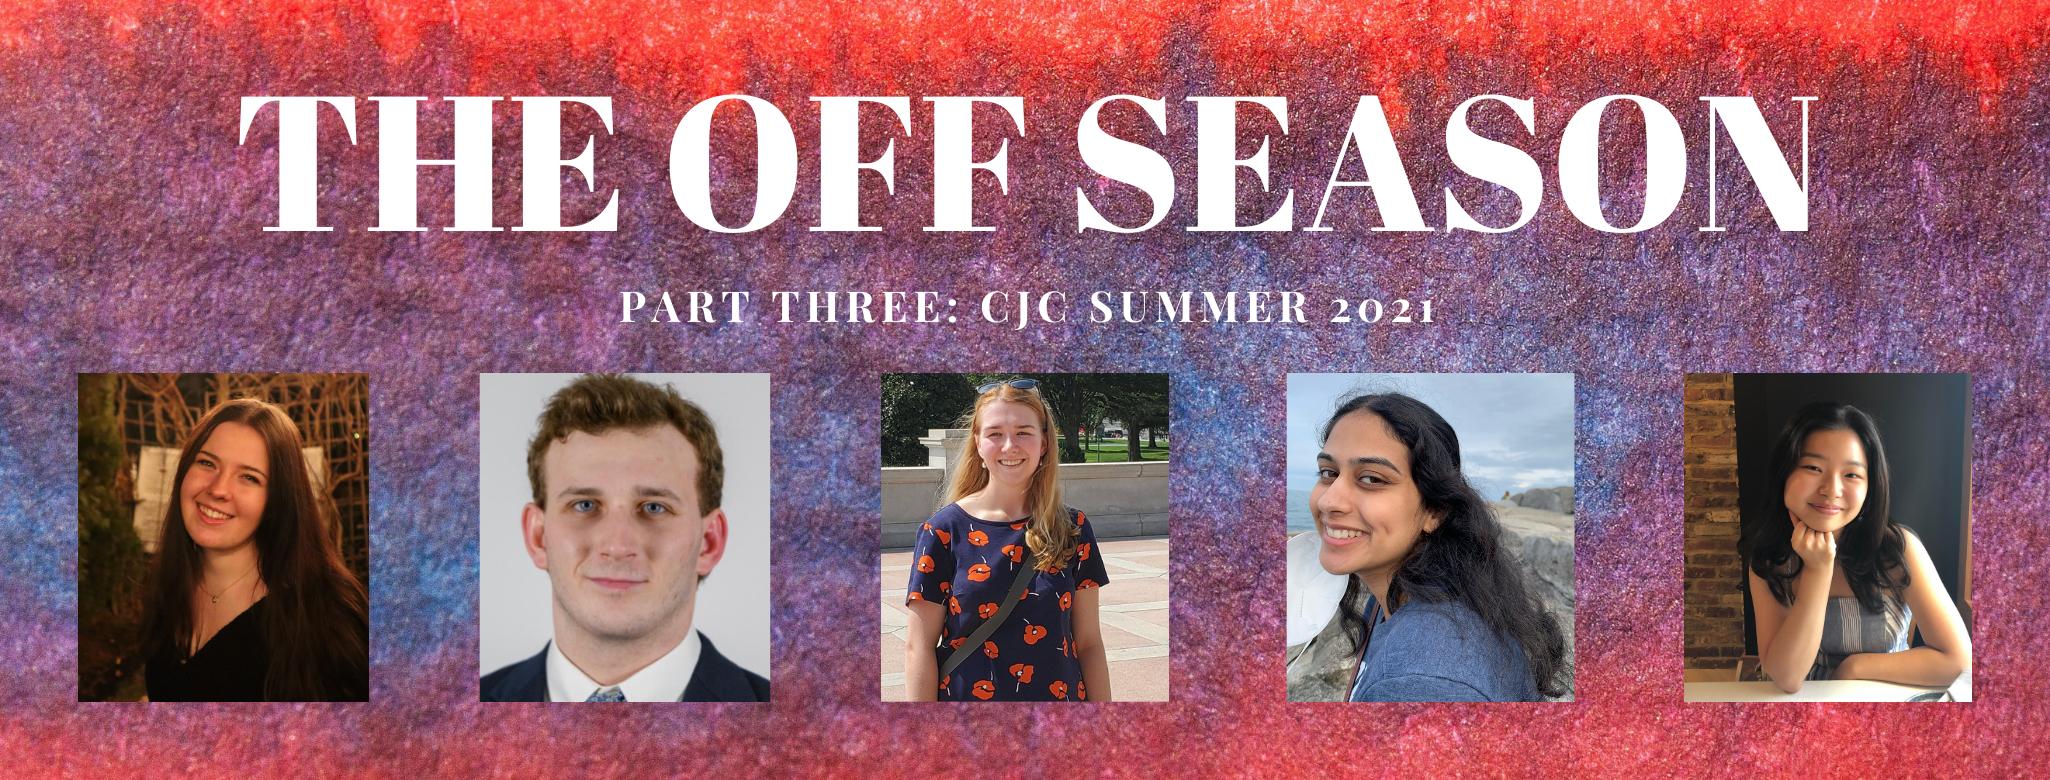 The off Season Part three: CJC Summer 2021